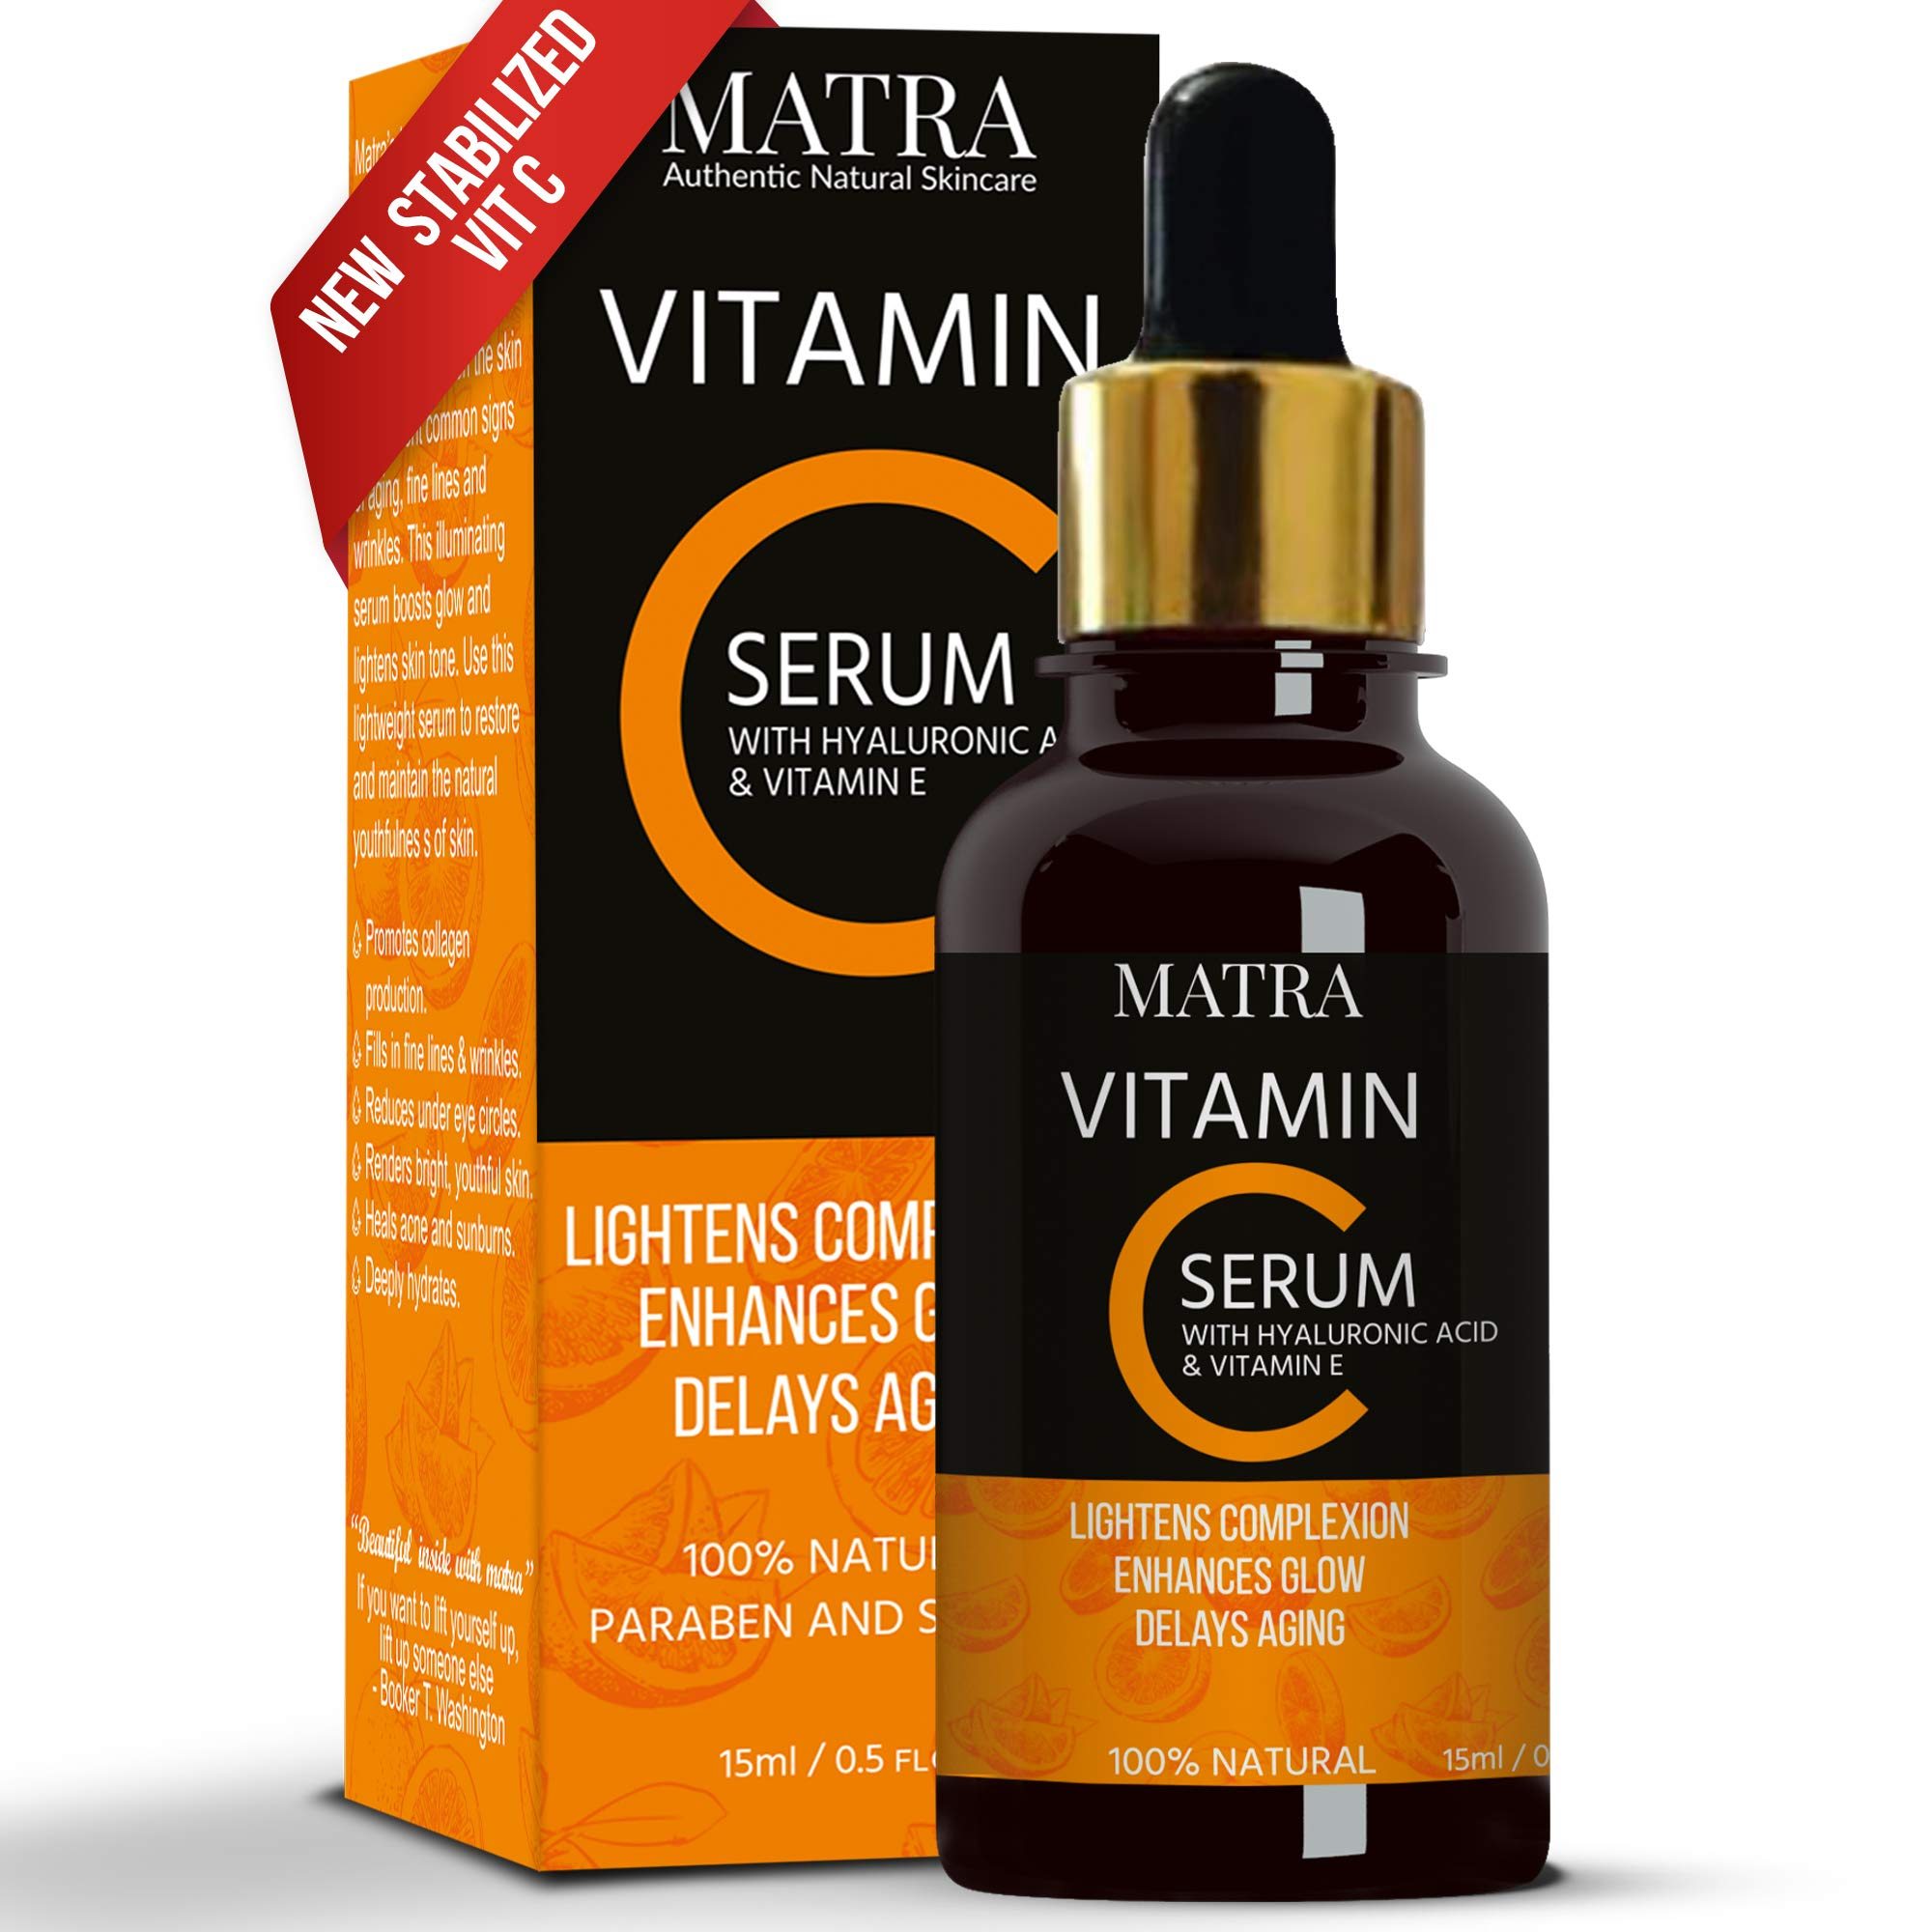 Matra Vitamin C Ultra Glow Serum with Hyaluronic Acid & Vit E for Skin Lightening & Anti-aging, 15ml